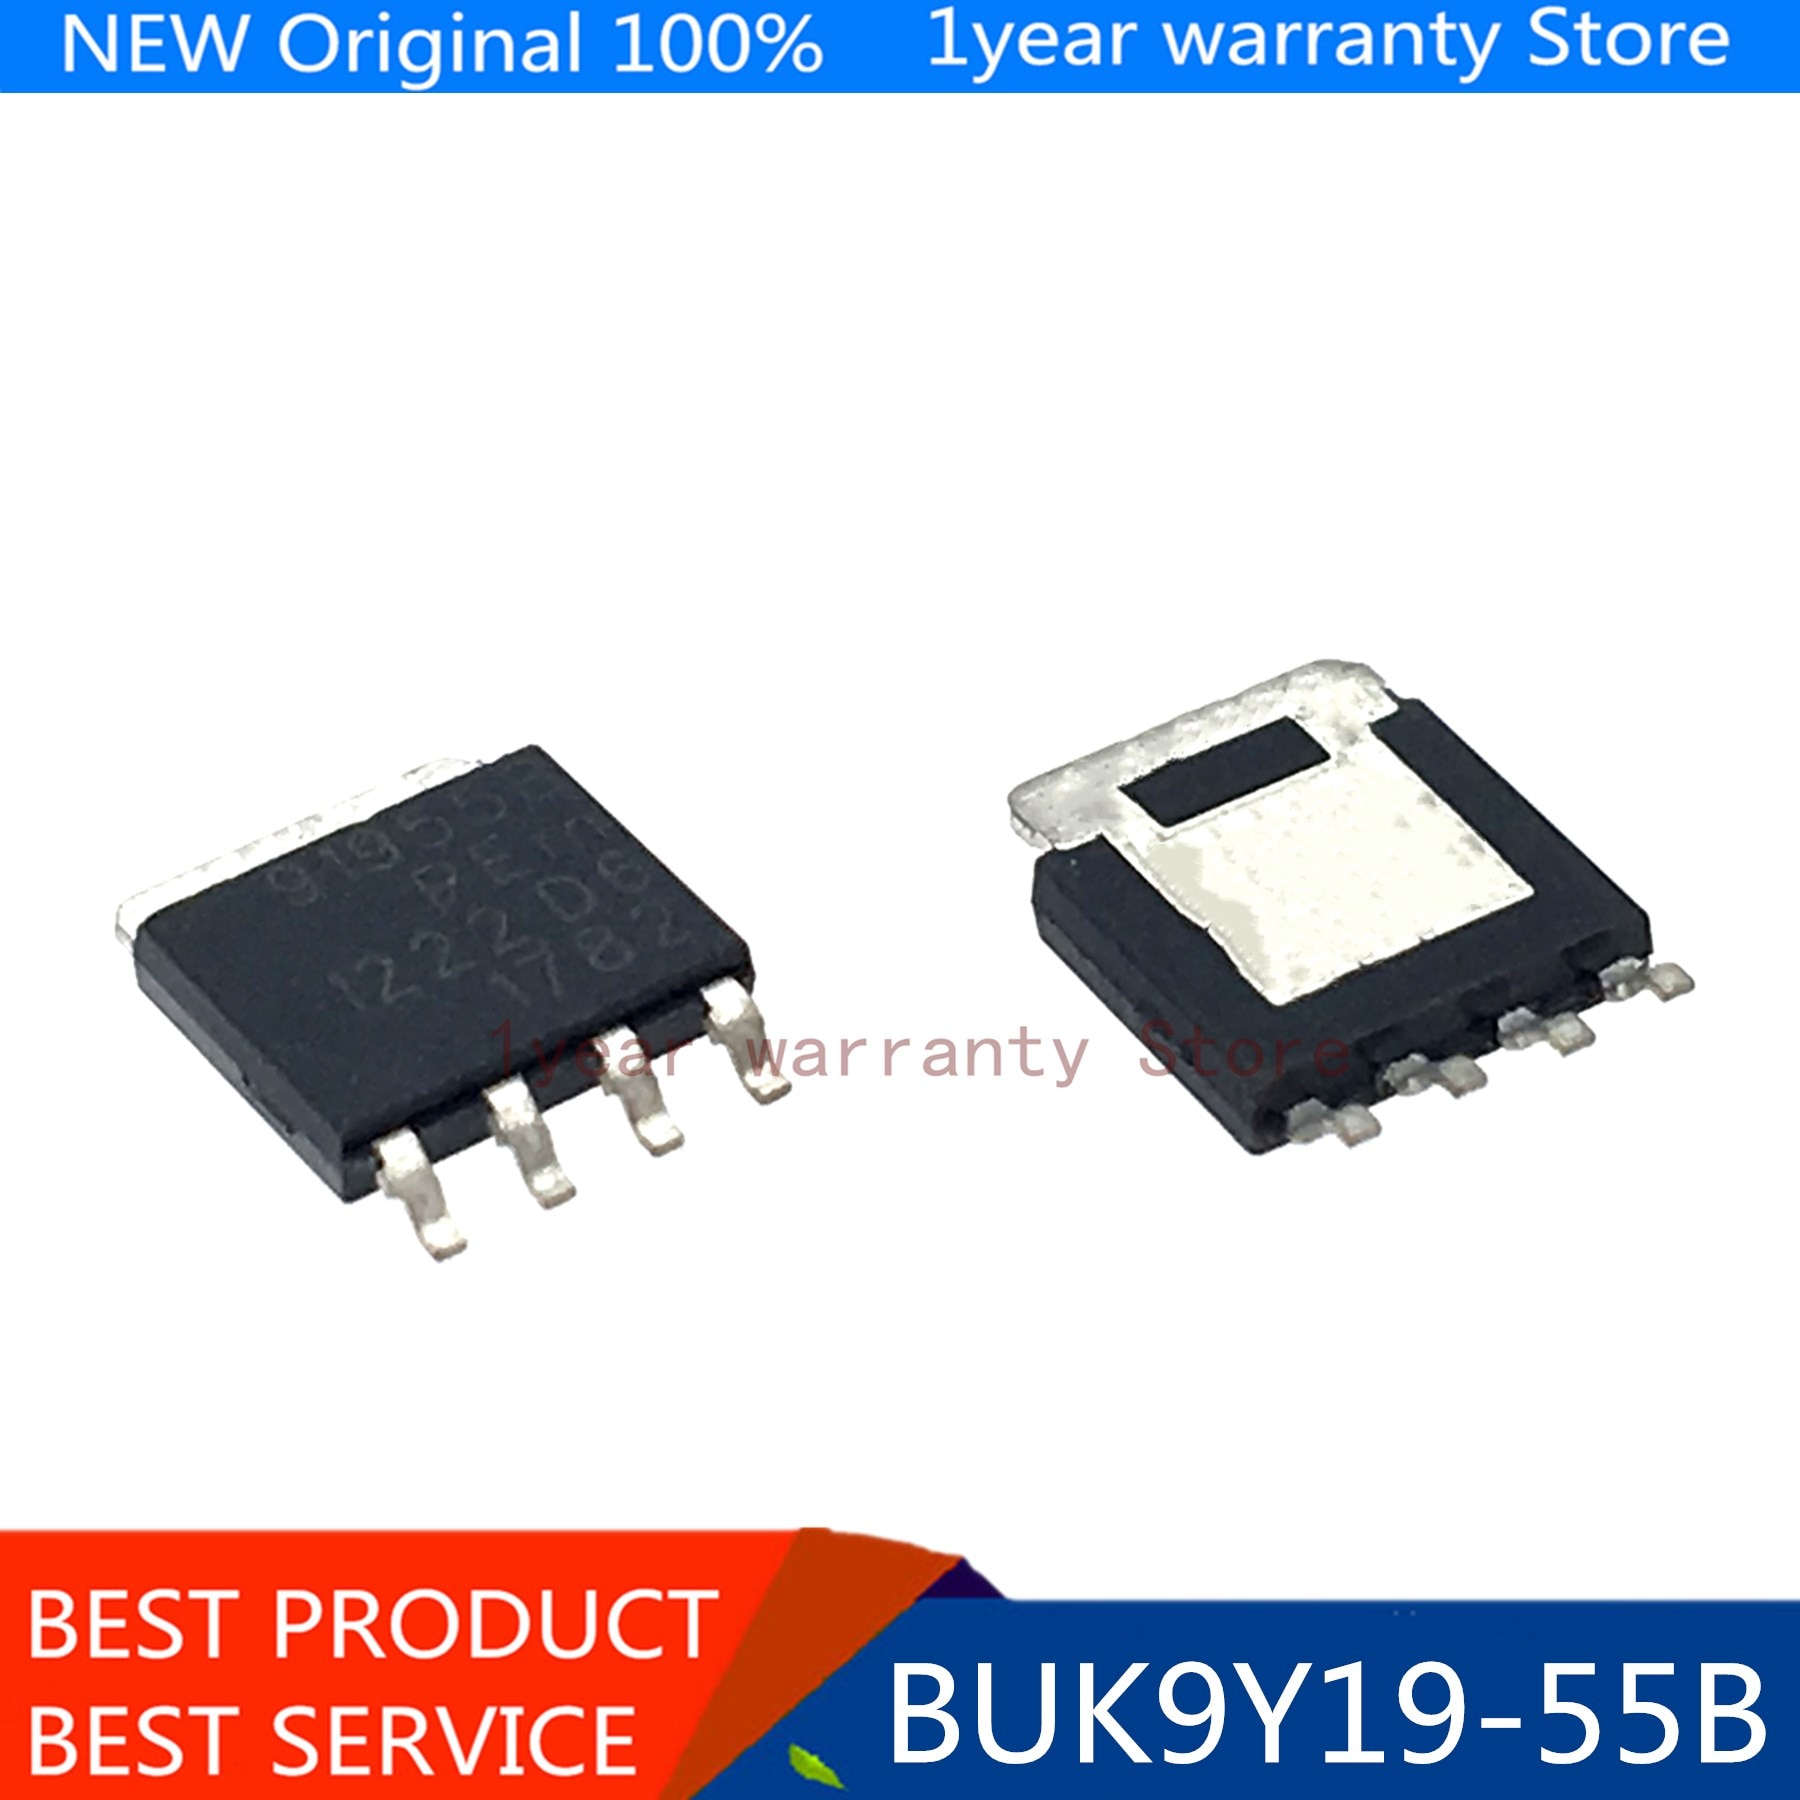 100% new imported original BUK9Y19-55B 91955B SO-T669 diesel engine board vulnerable maintenance chip